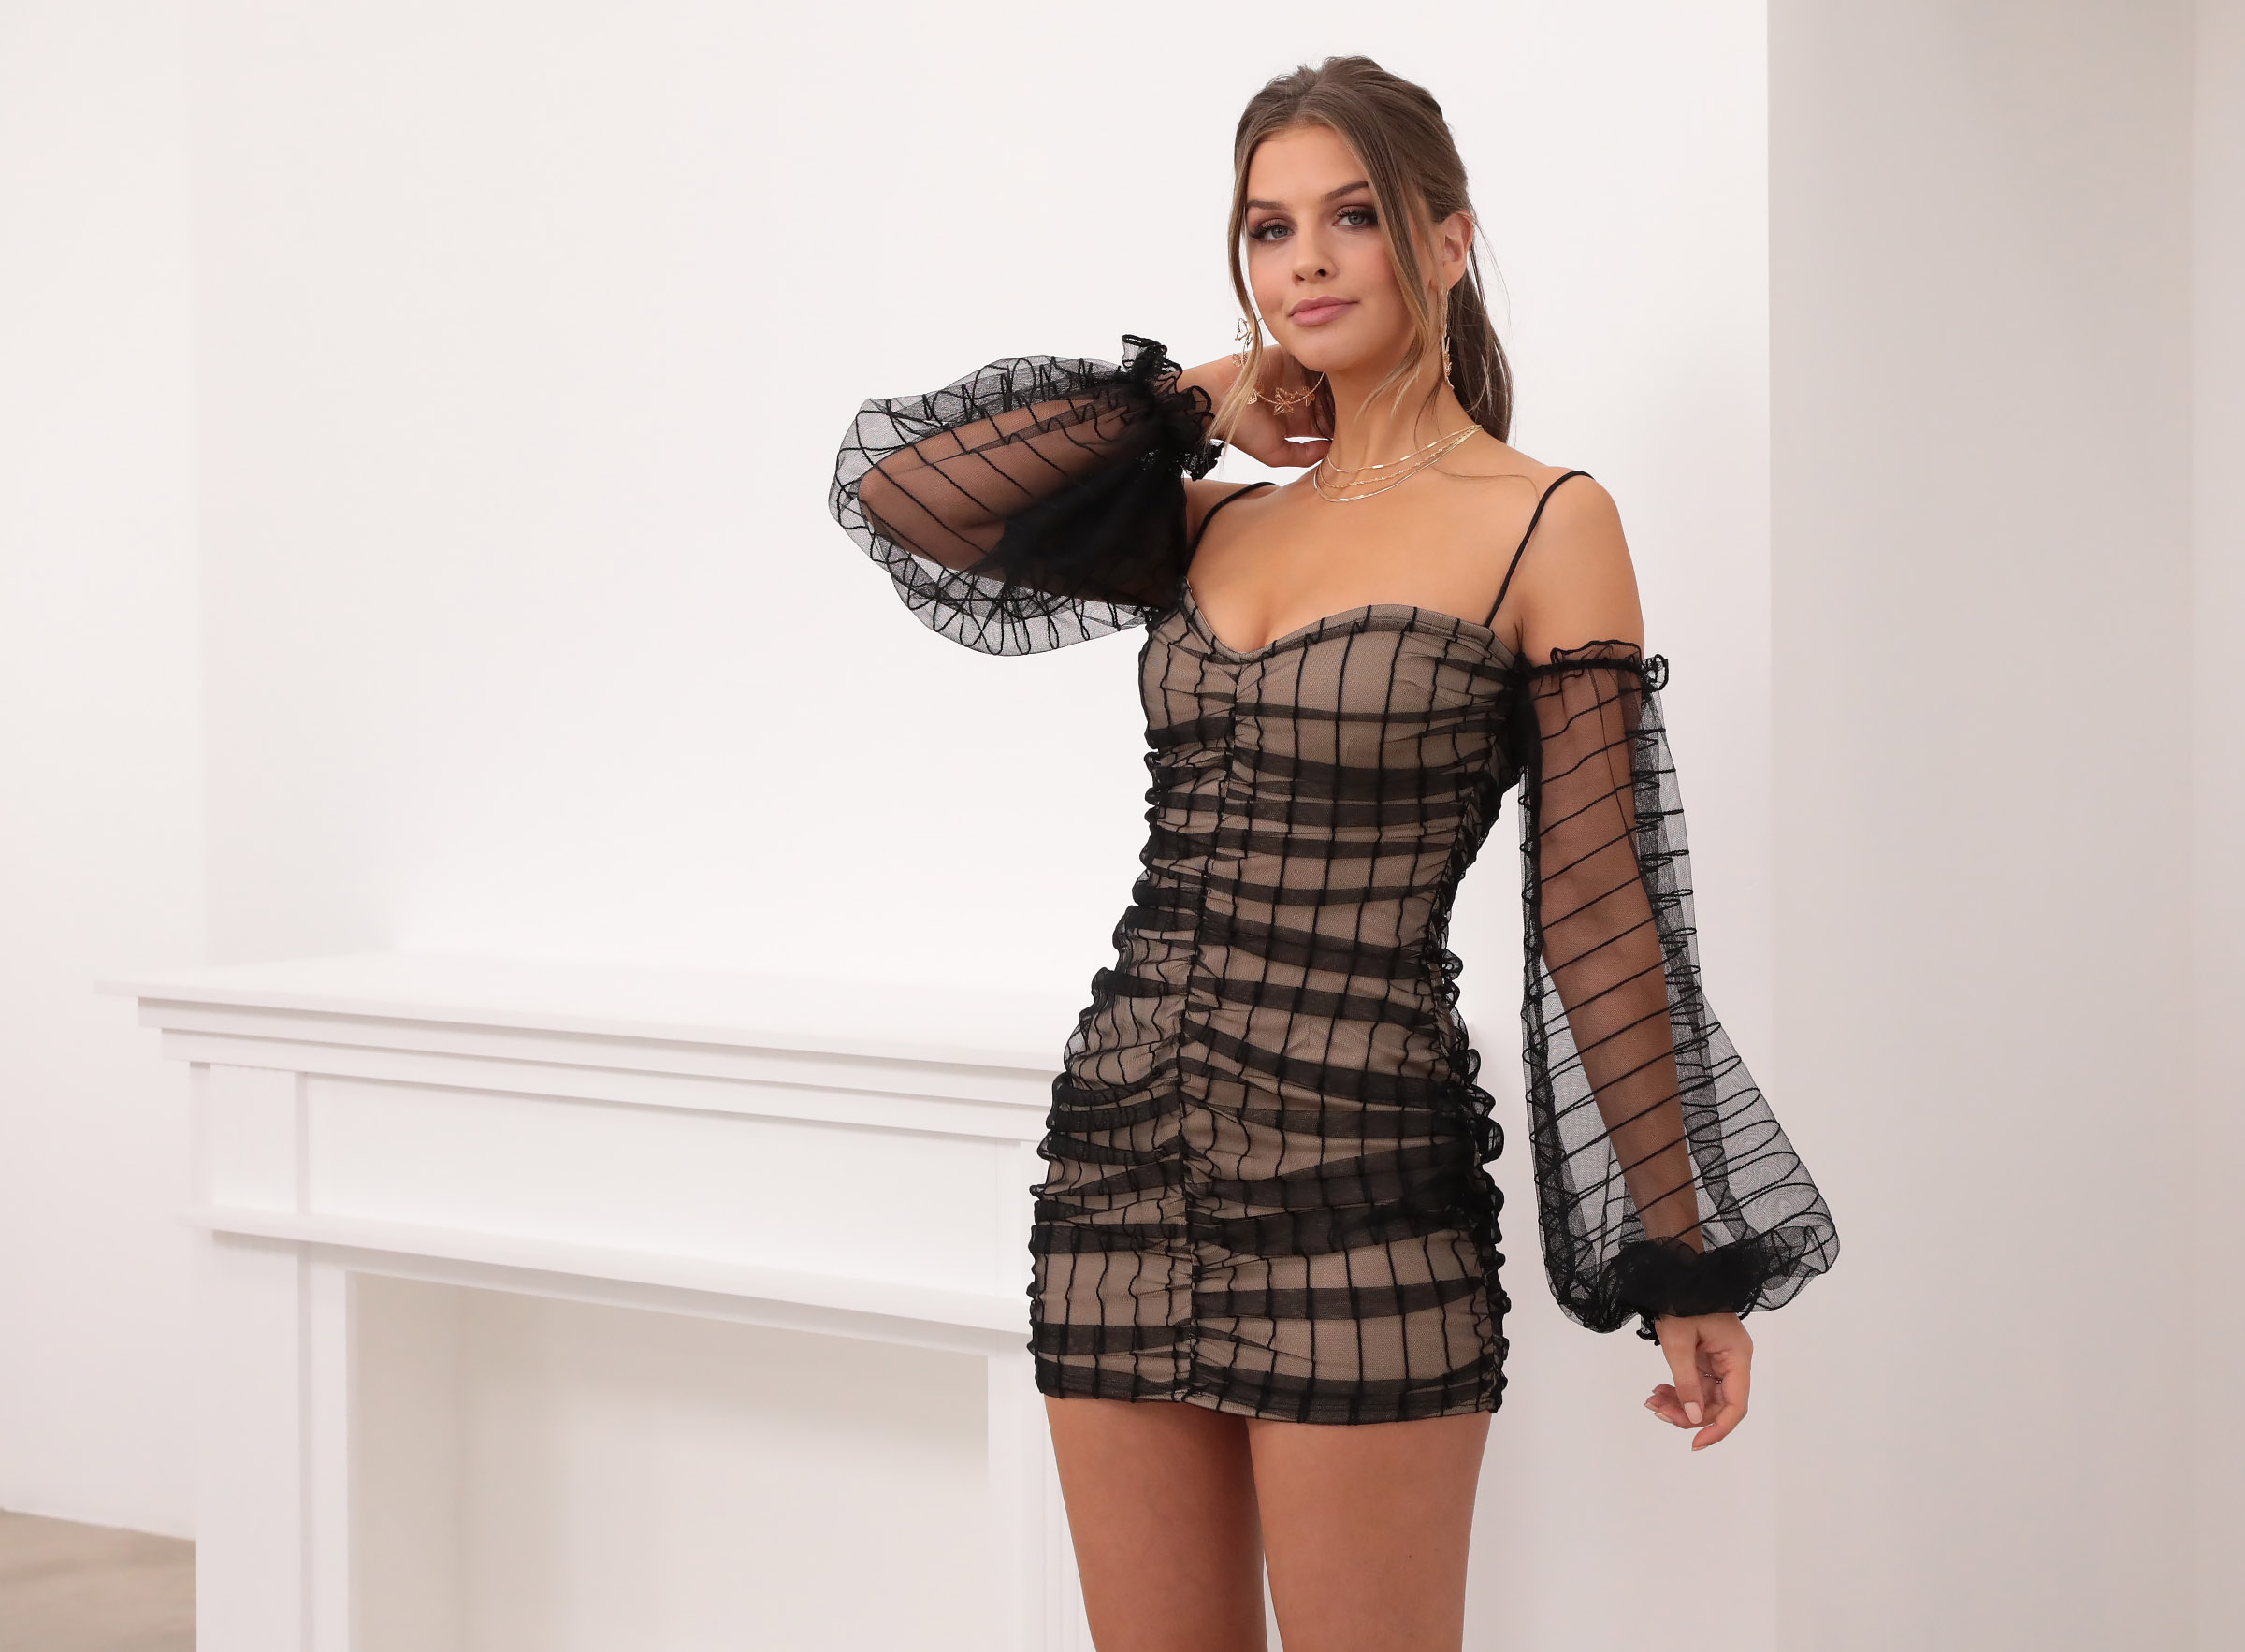 Natalia Mesh Draped Dress in Black